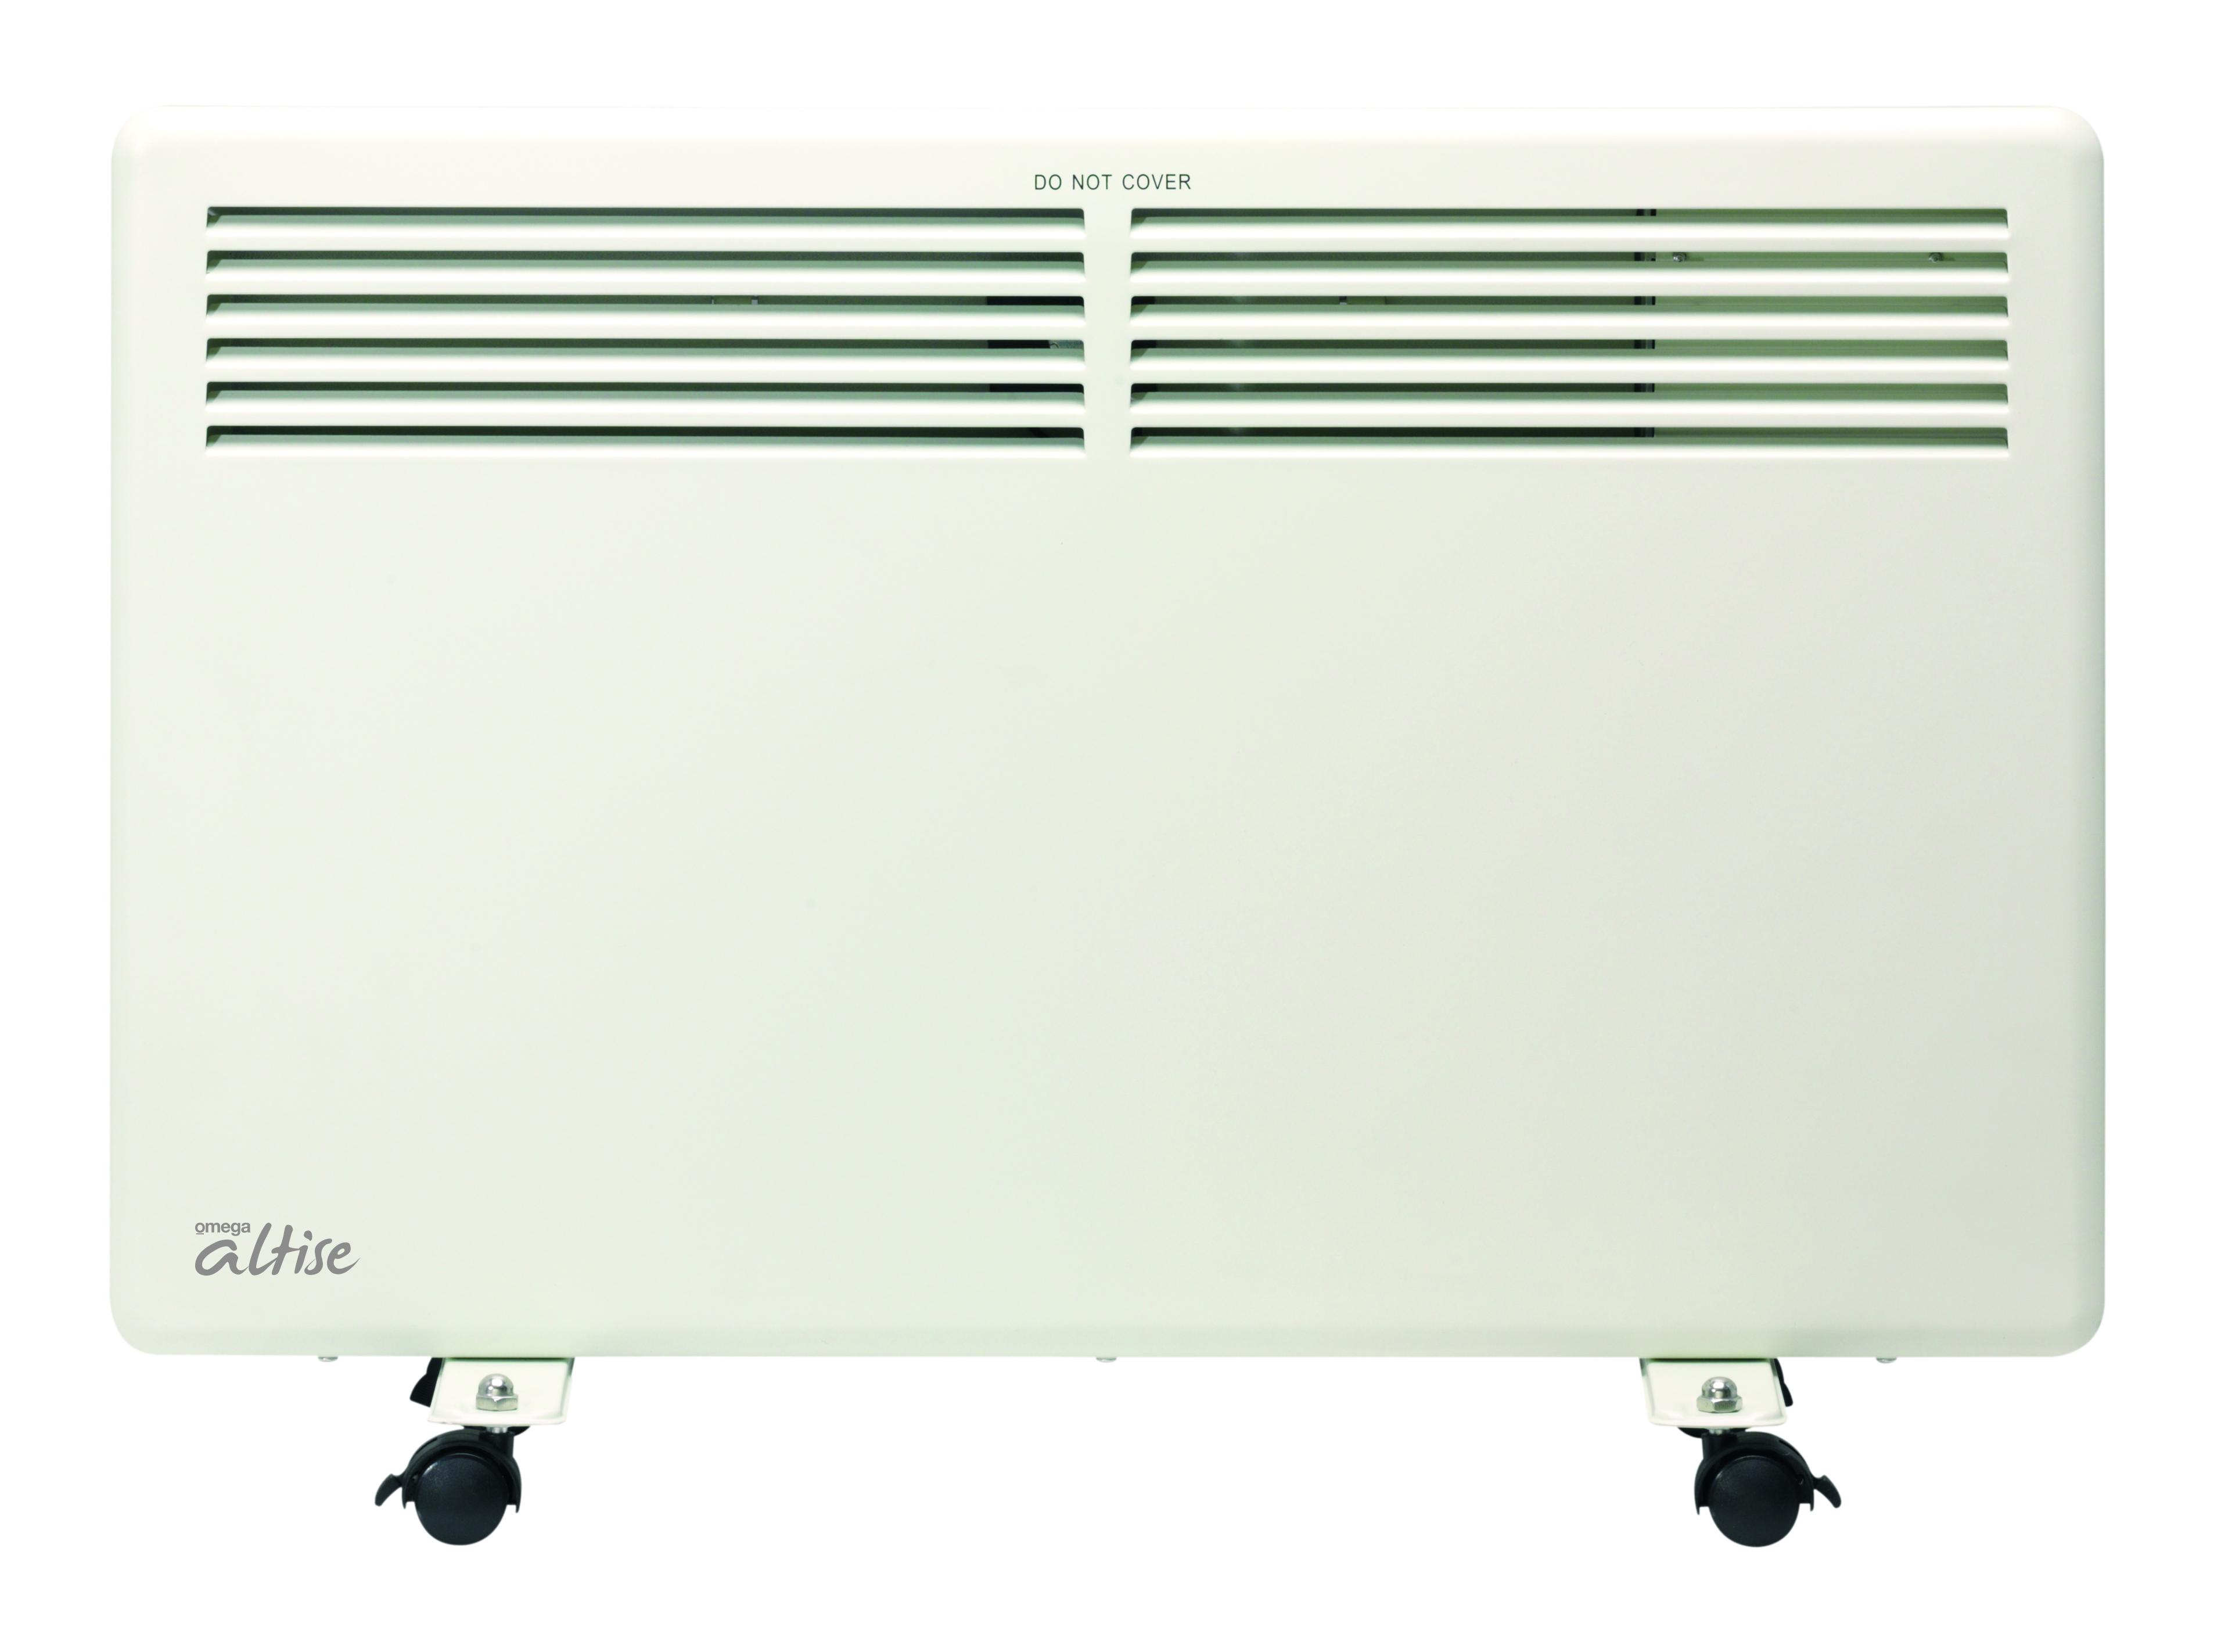 Omega Altise product Panel Heater - Bone White1500WAHPE152W